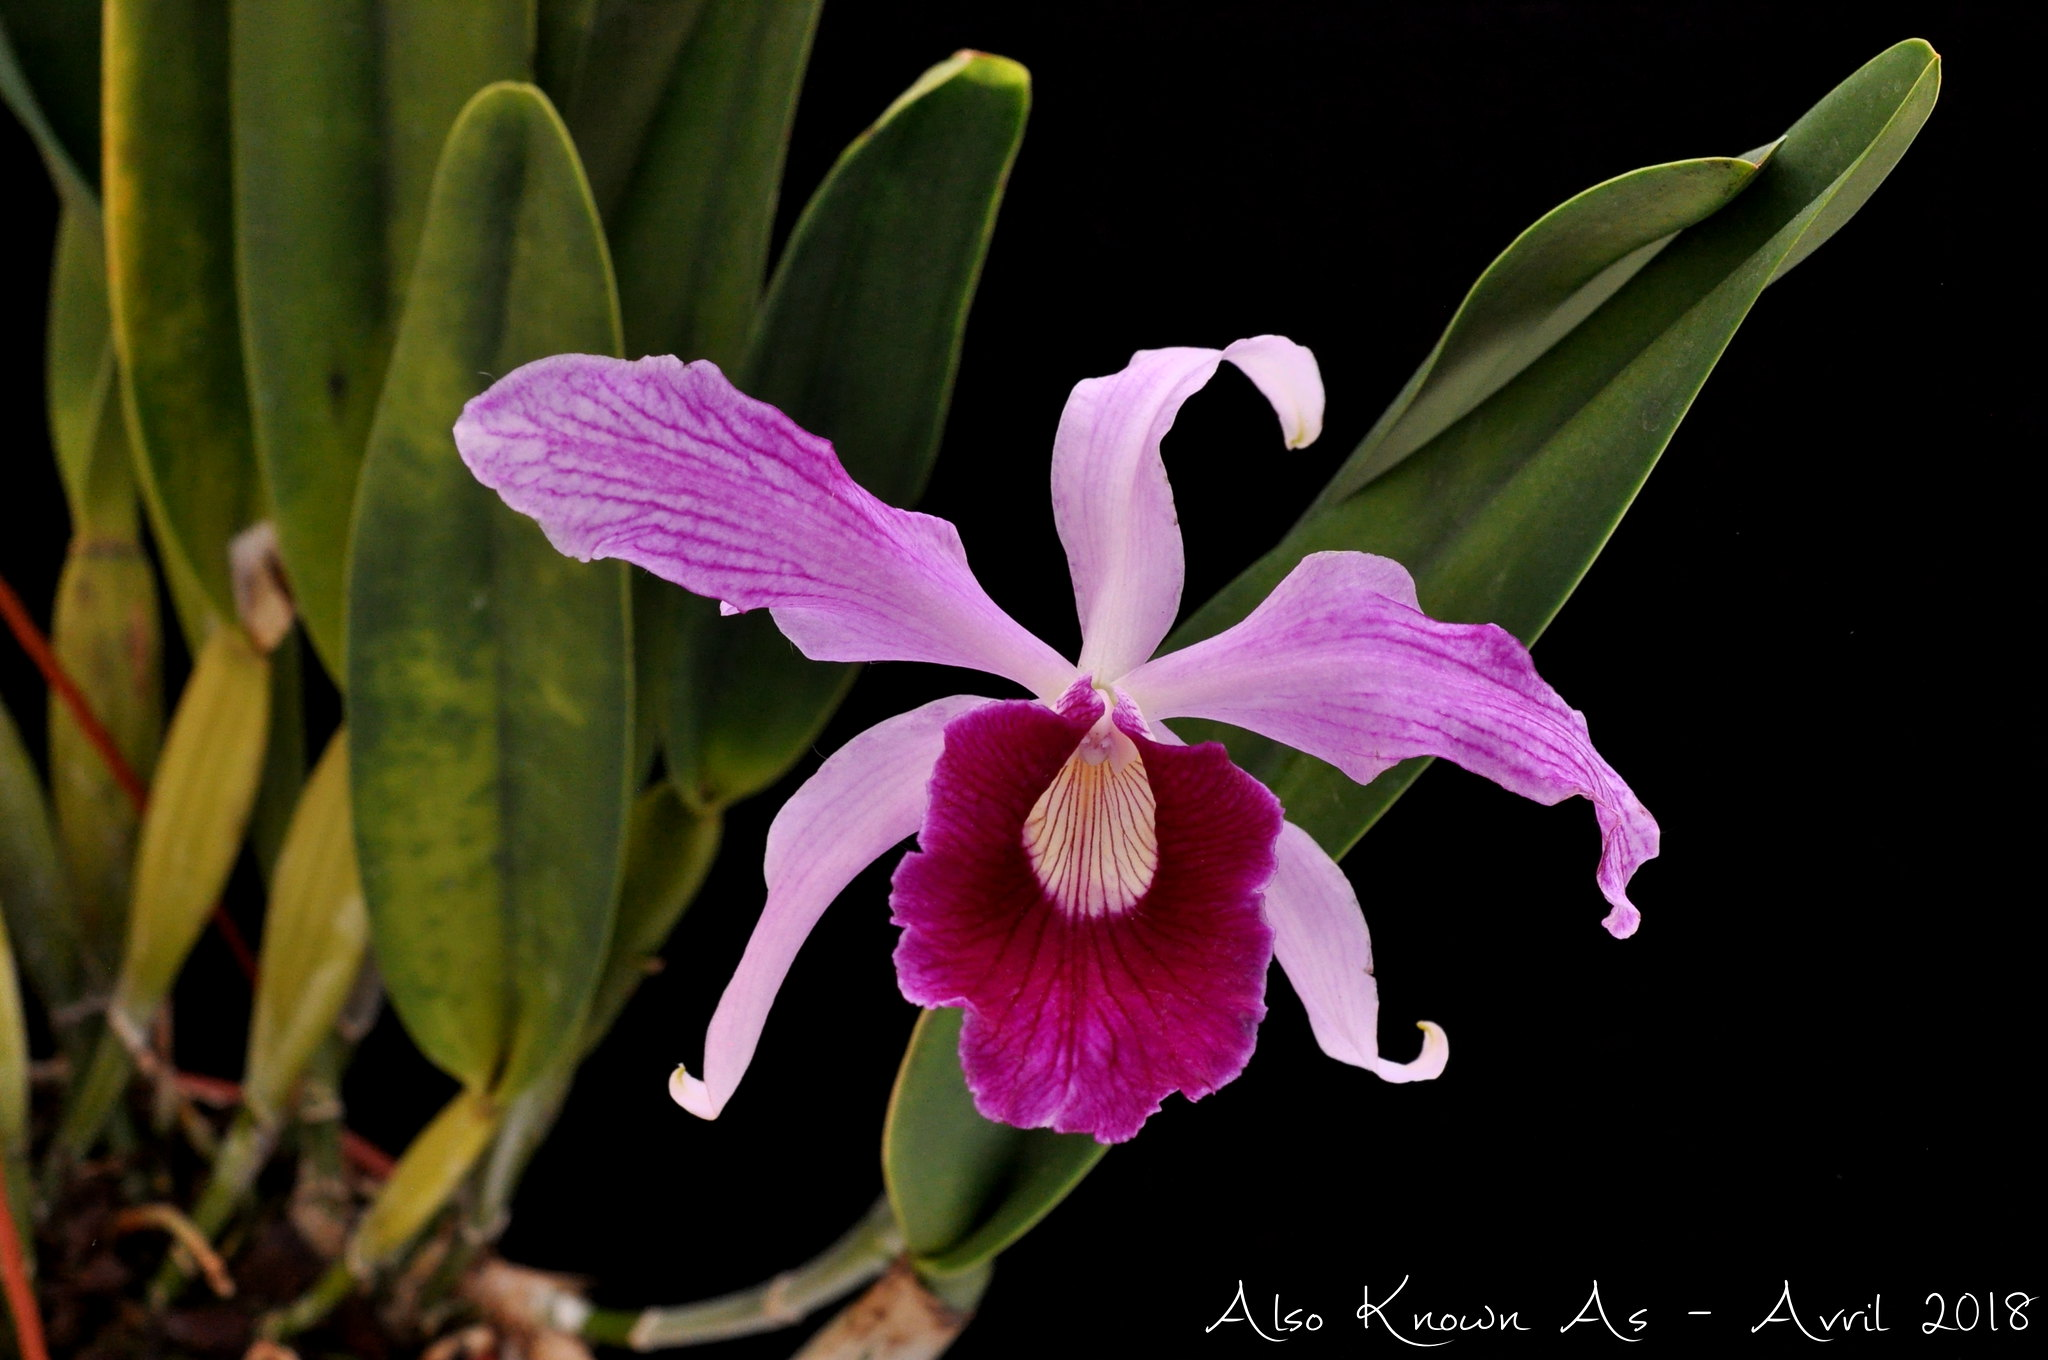 Cattleya purpurata f. flamea 'Dos Ganchos' 41719507712_877c201dbd_k